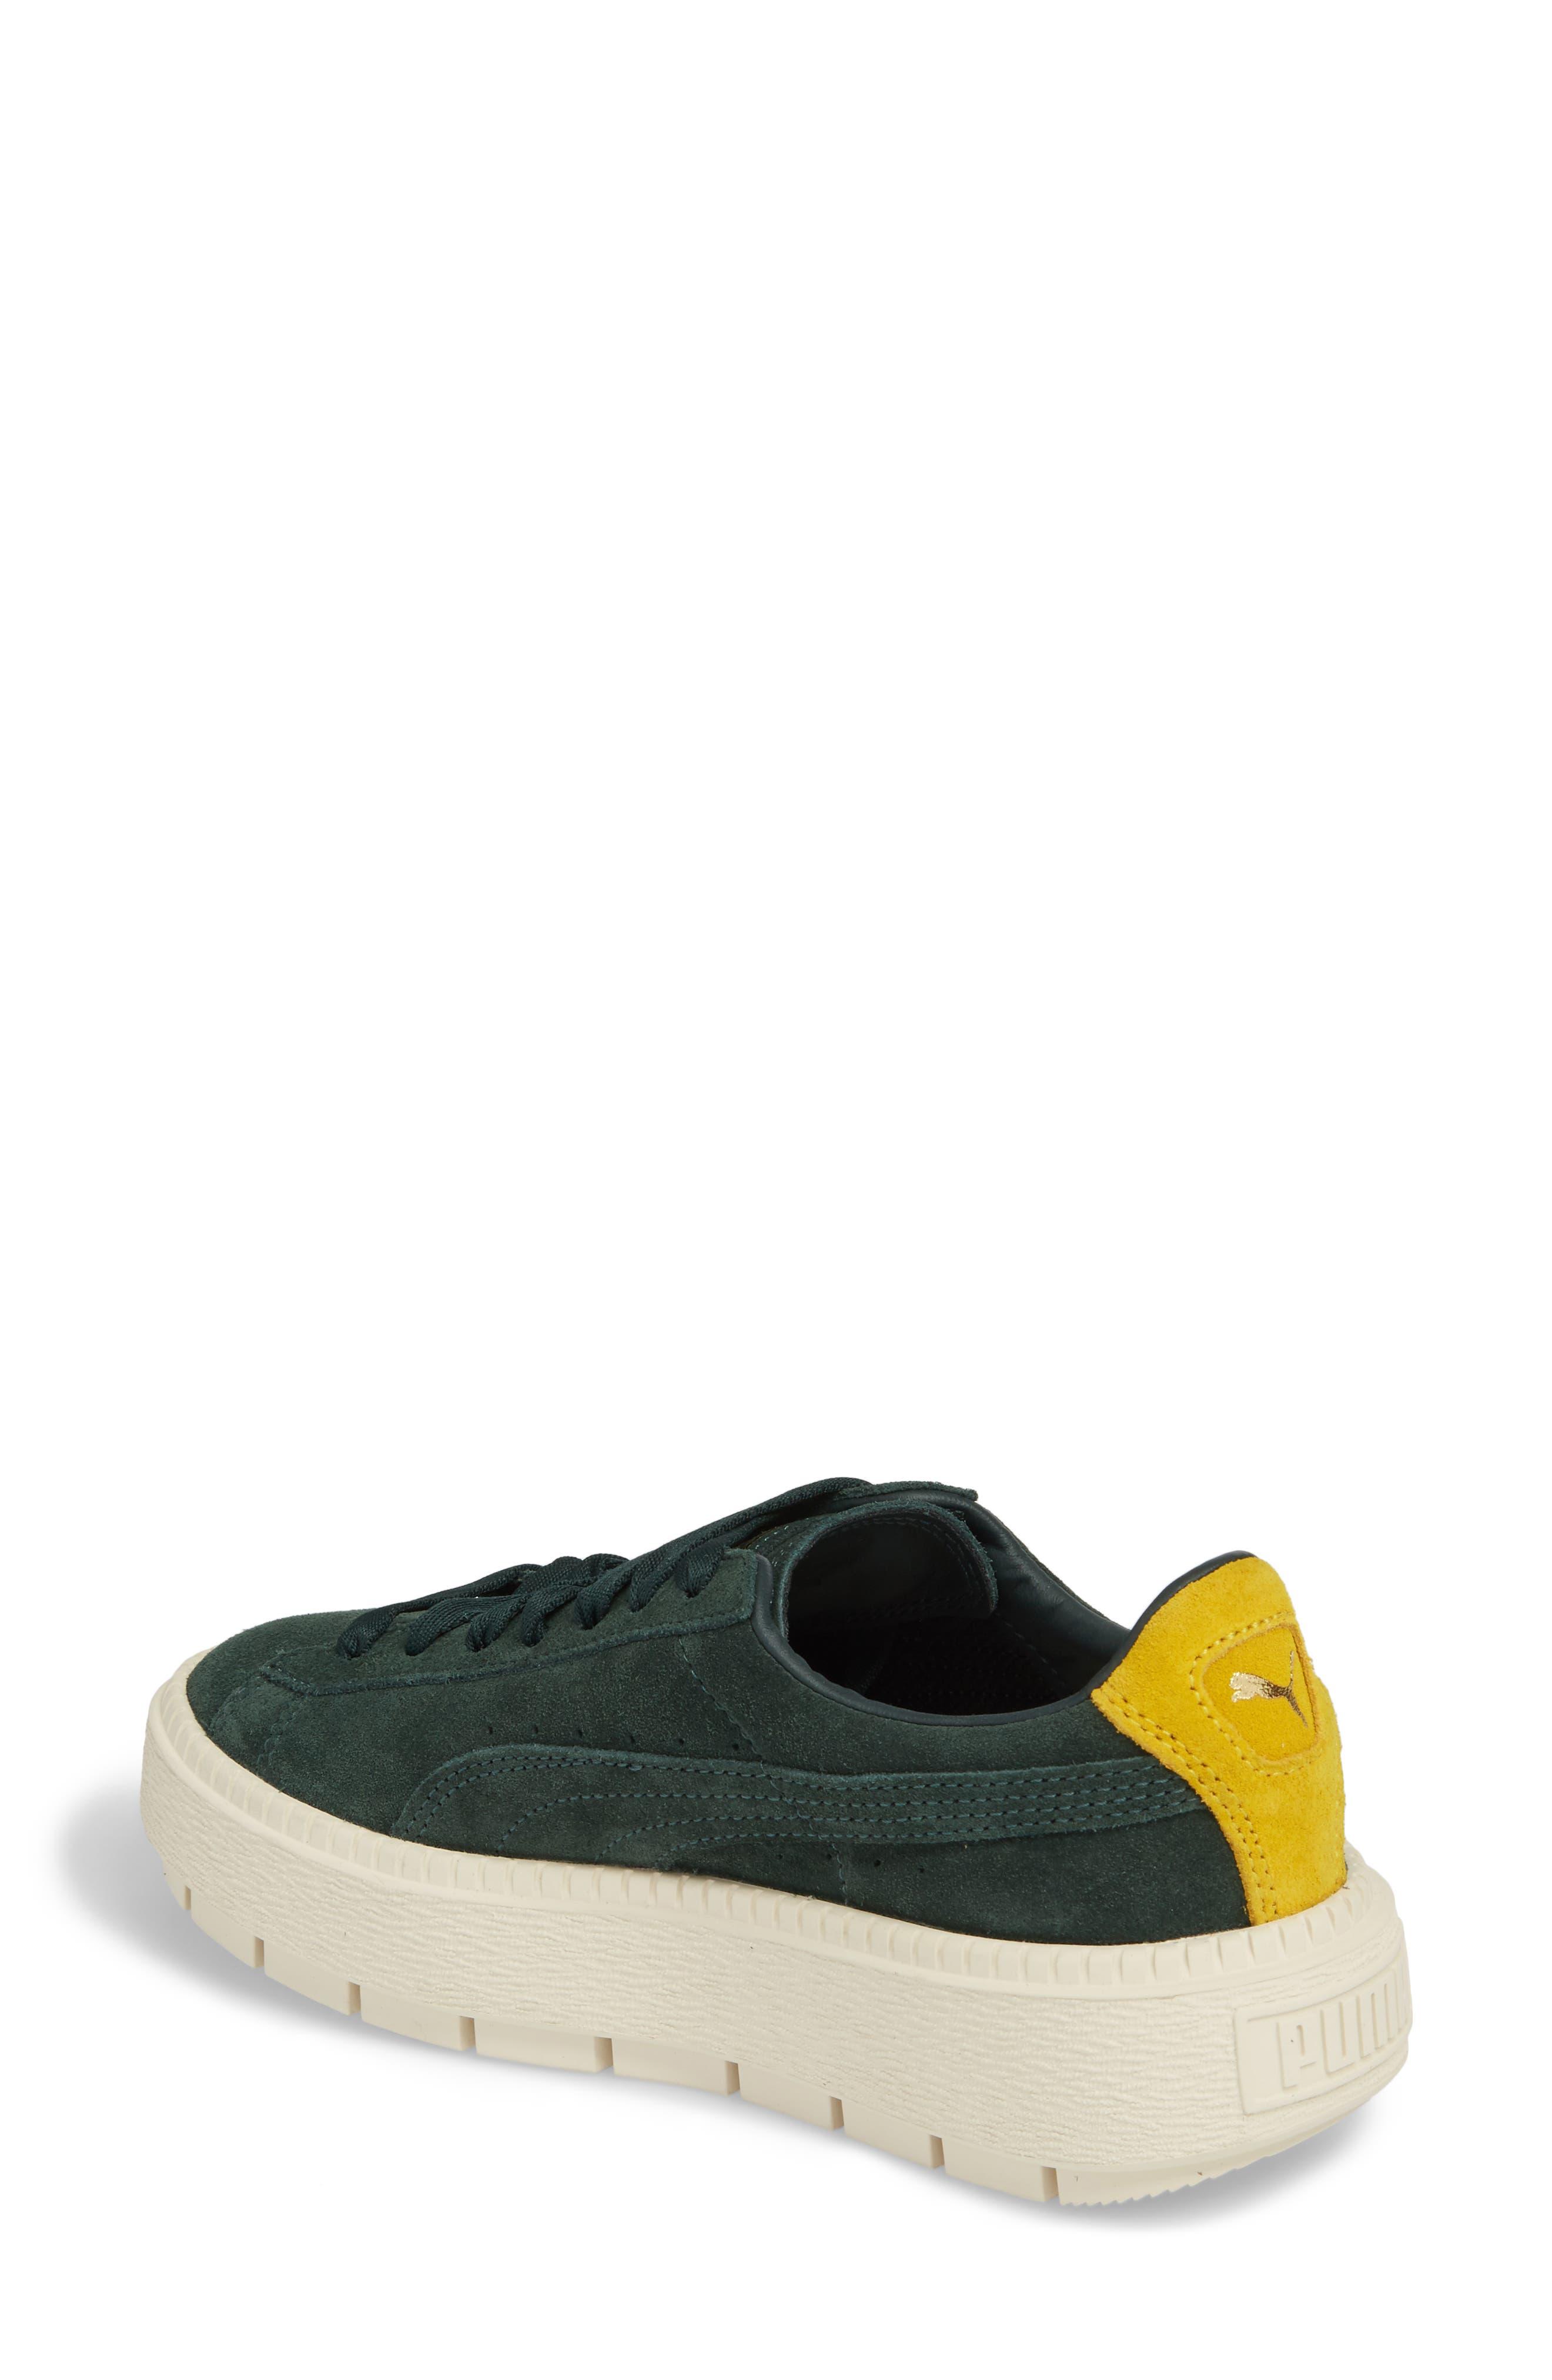 Platform Trace Bold Sneaker,                             Alternate thumbnail 2, color,                             Scrab-Lemon -Vanilla Ice